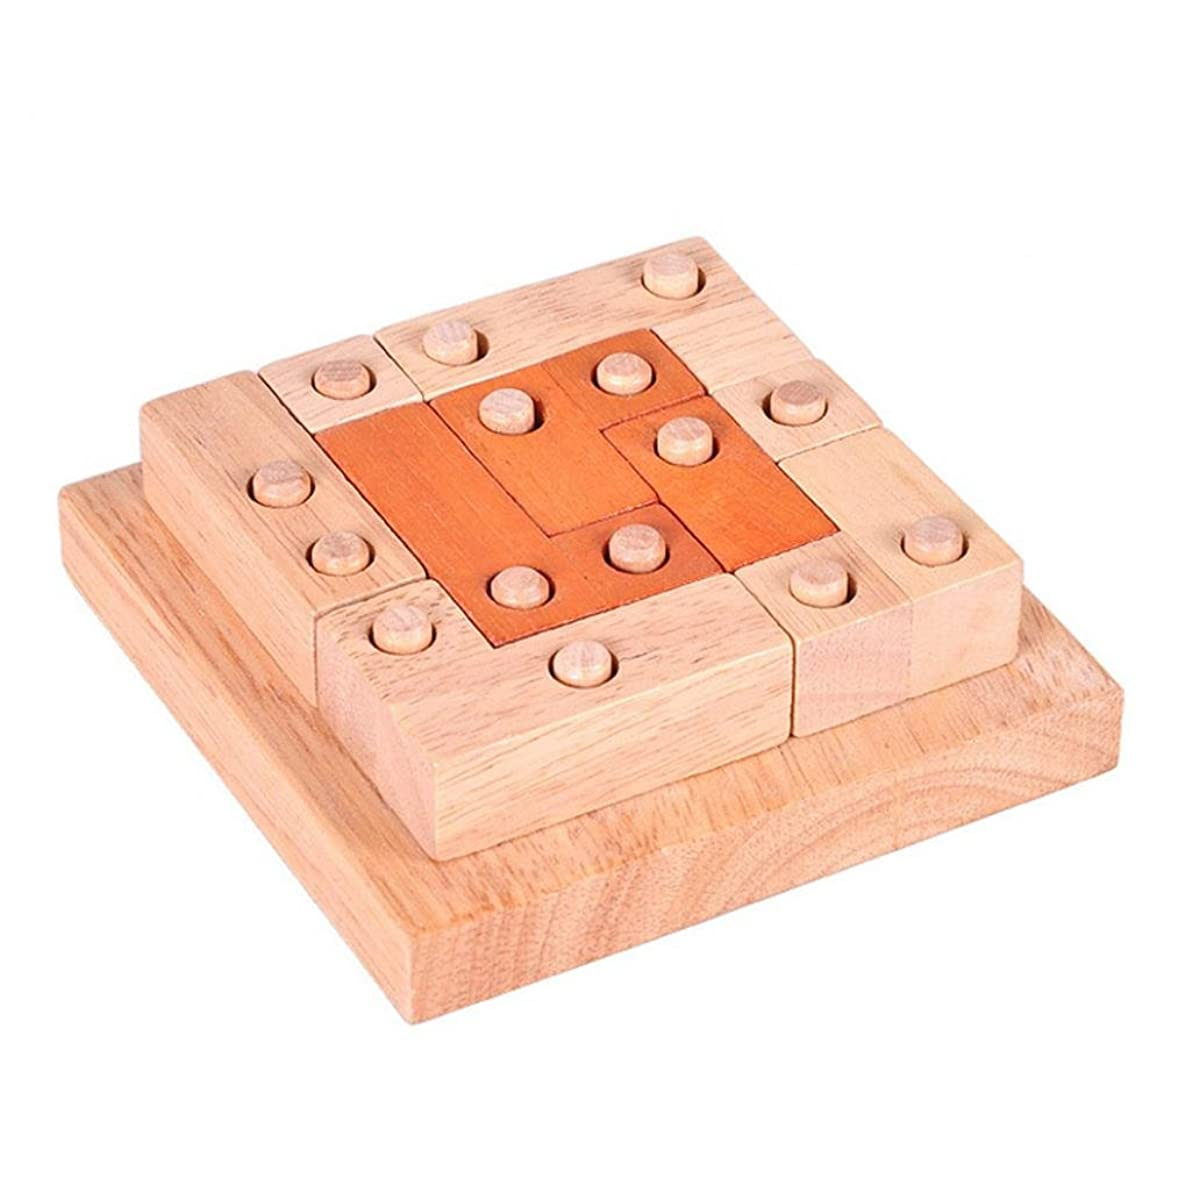 hwangli Wooden Building Blocks Kong Ming Luban Lock Adults Kids Puzzle Educational Toys